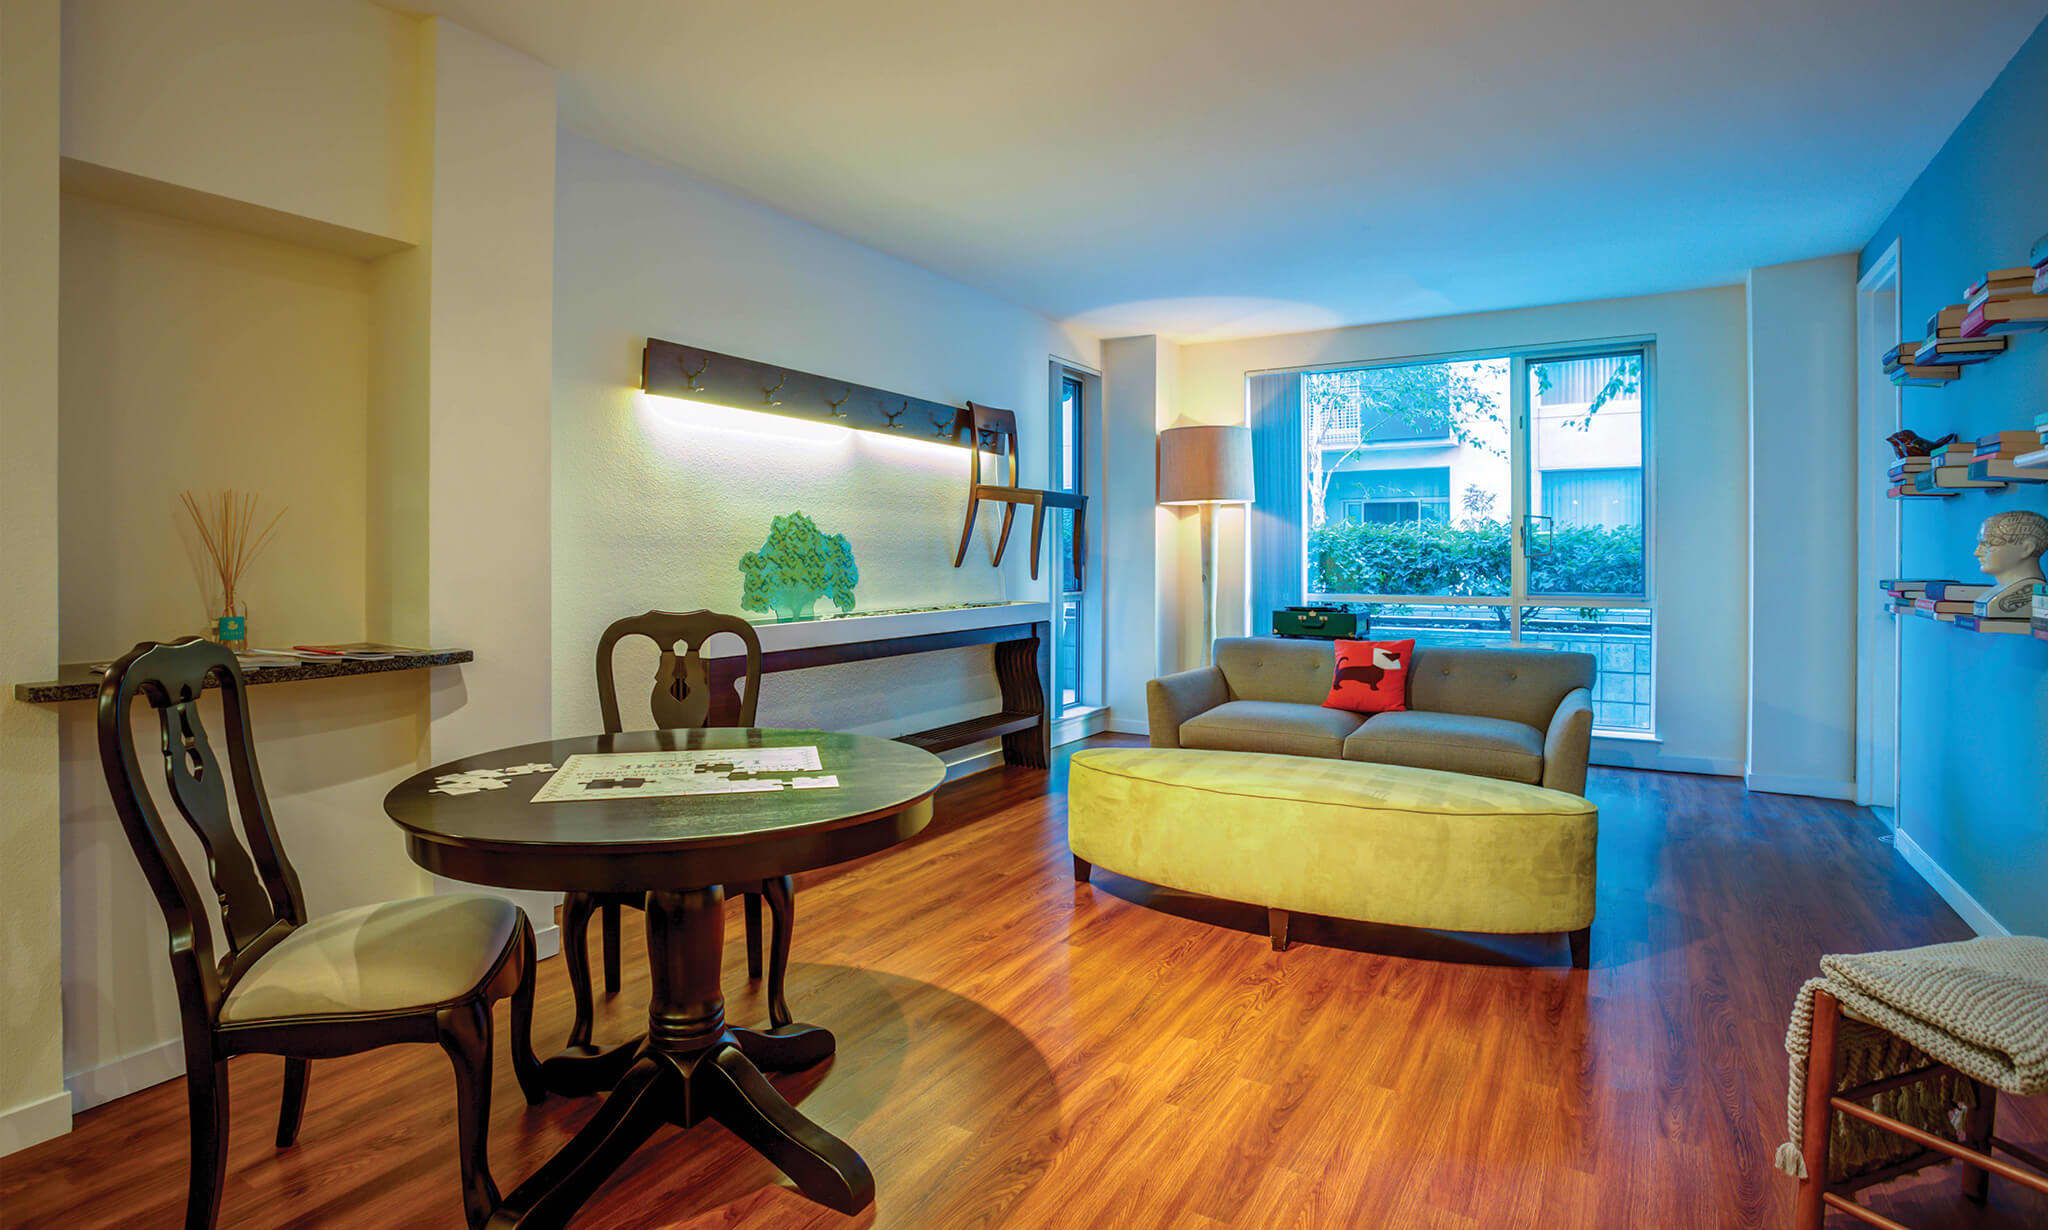 550 Moreland Apartments apartments in Santa Clara CA to rent photo 10